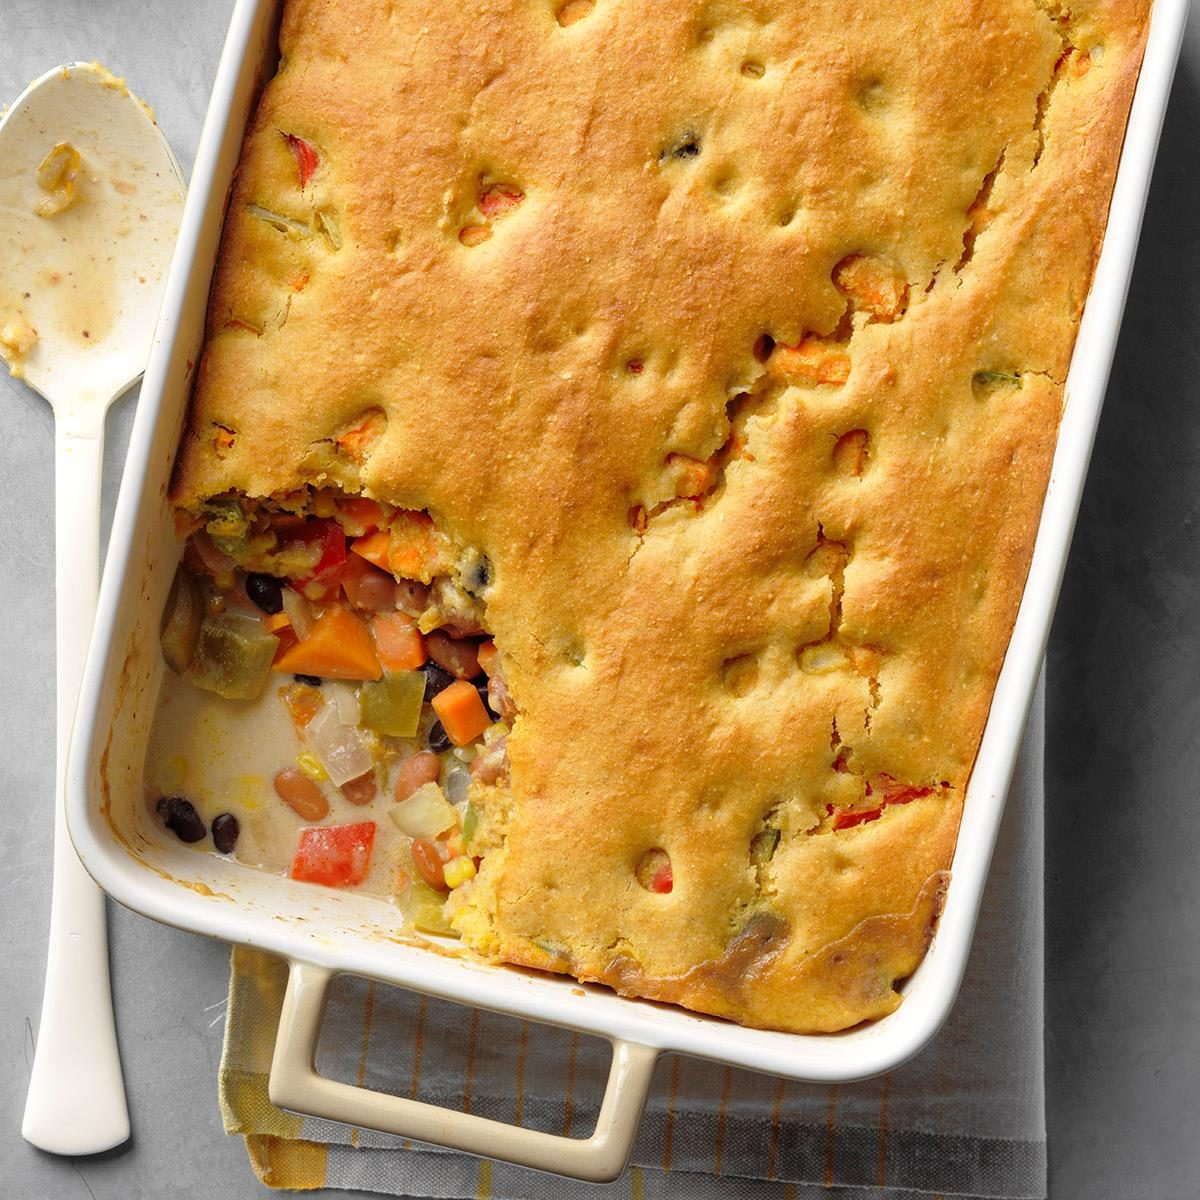 Tex-Mex Bean Bake with Cornbread Topping